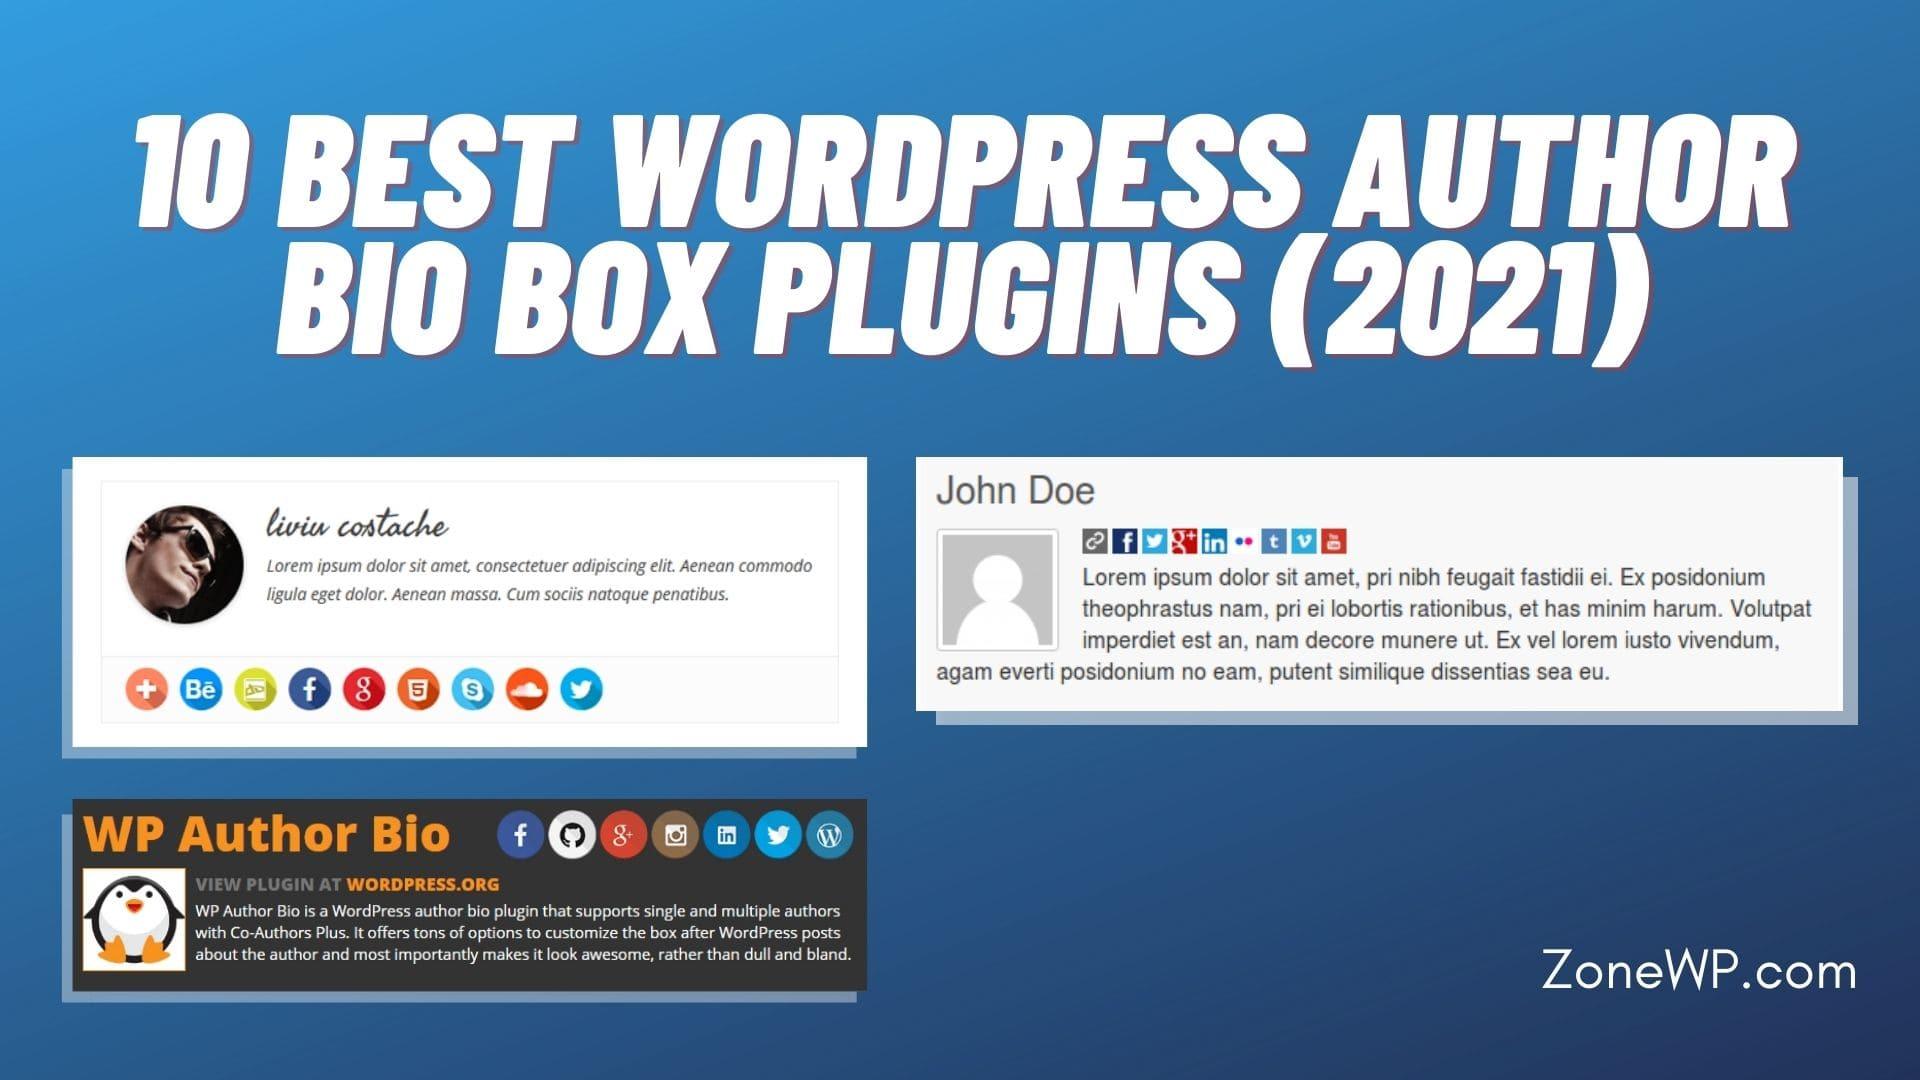 10 Best WordPress Author Bio Box Plugins (2021)